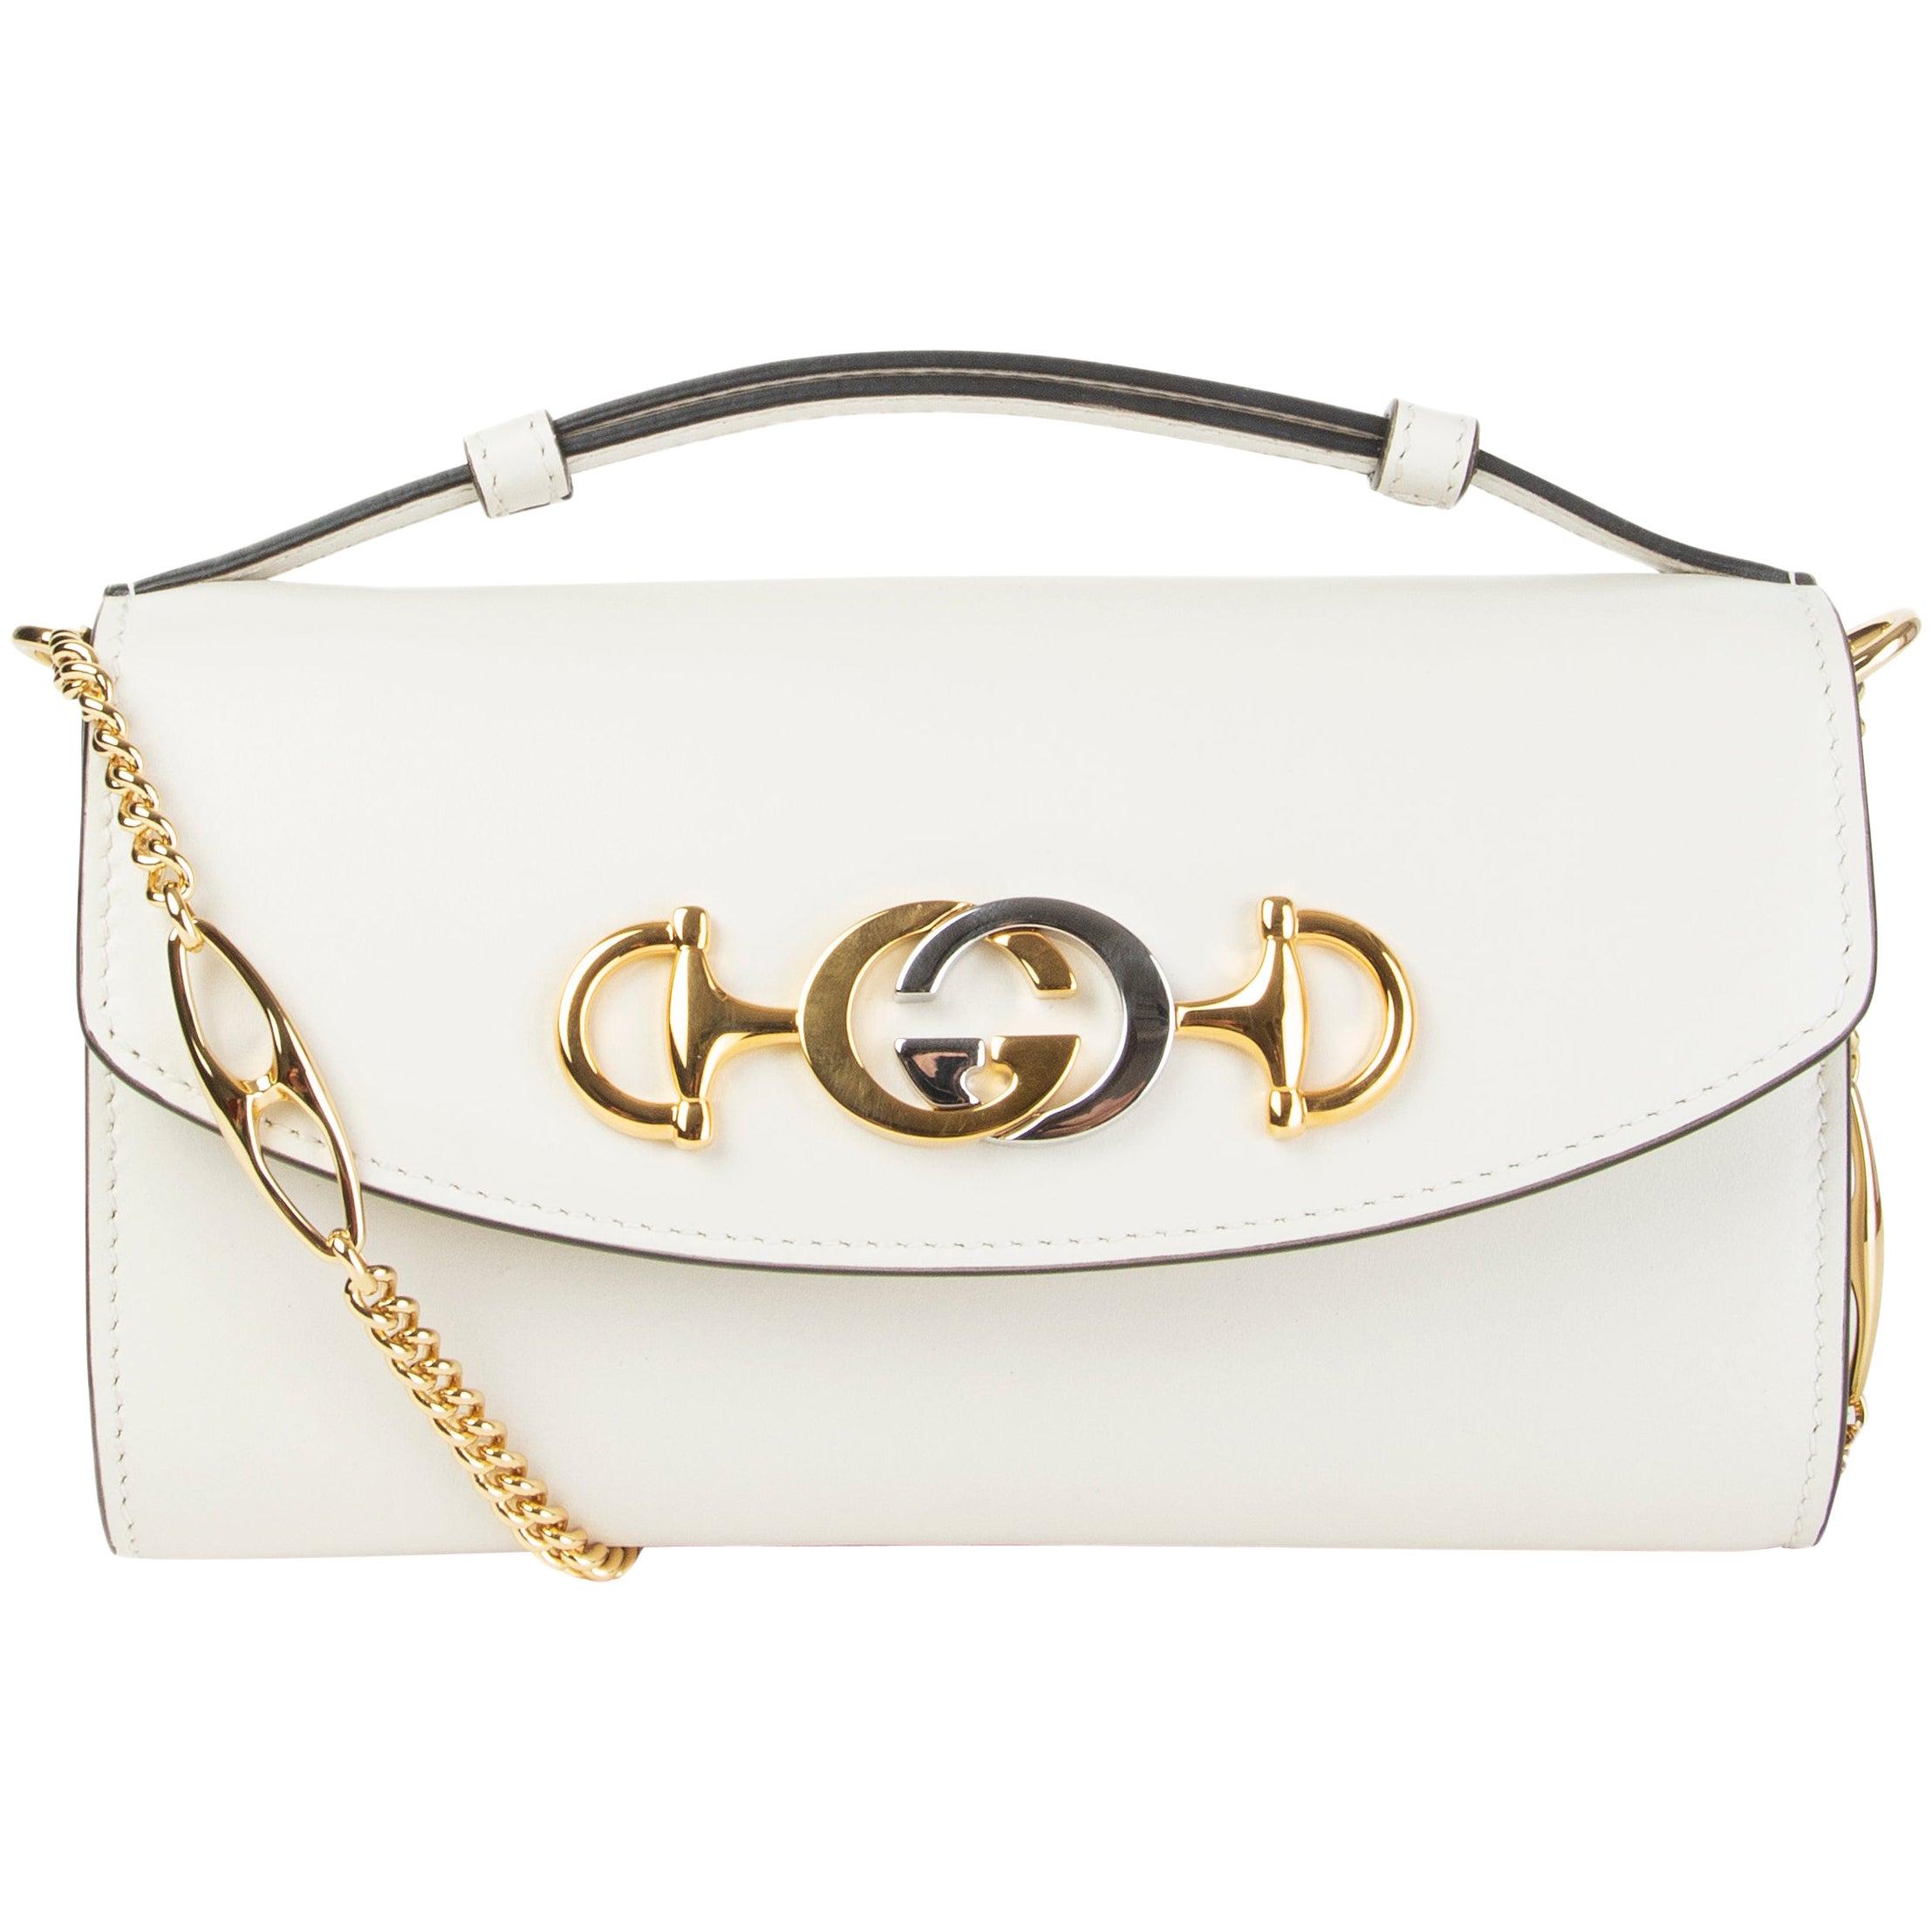 GUCCI white smooth leather ZUMI MINI Shoulder Bag